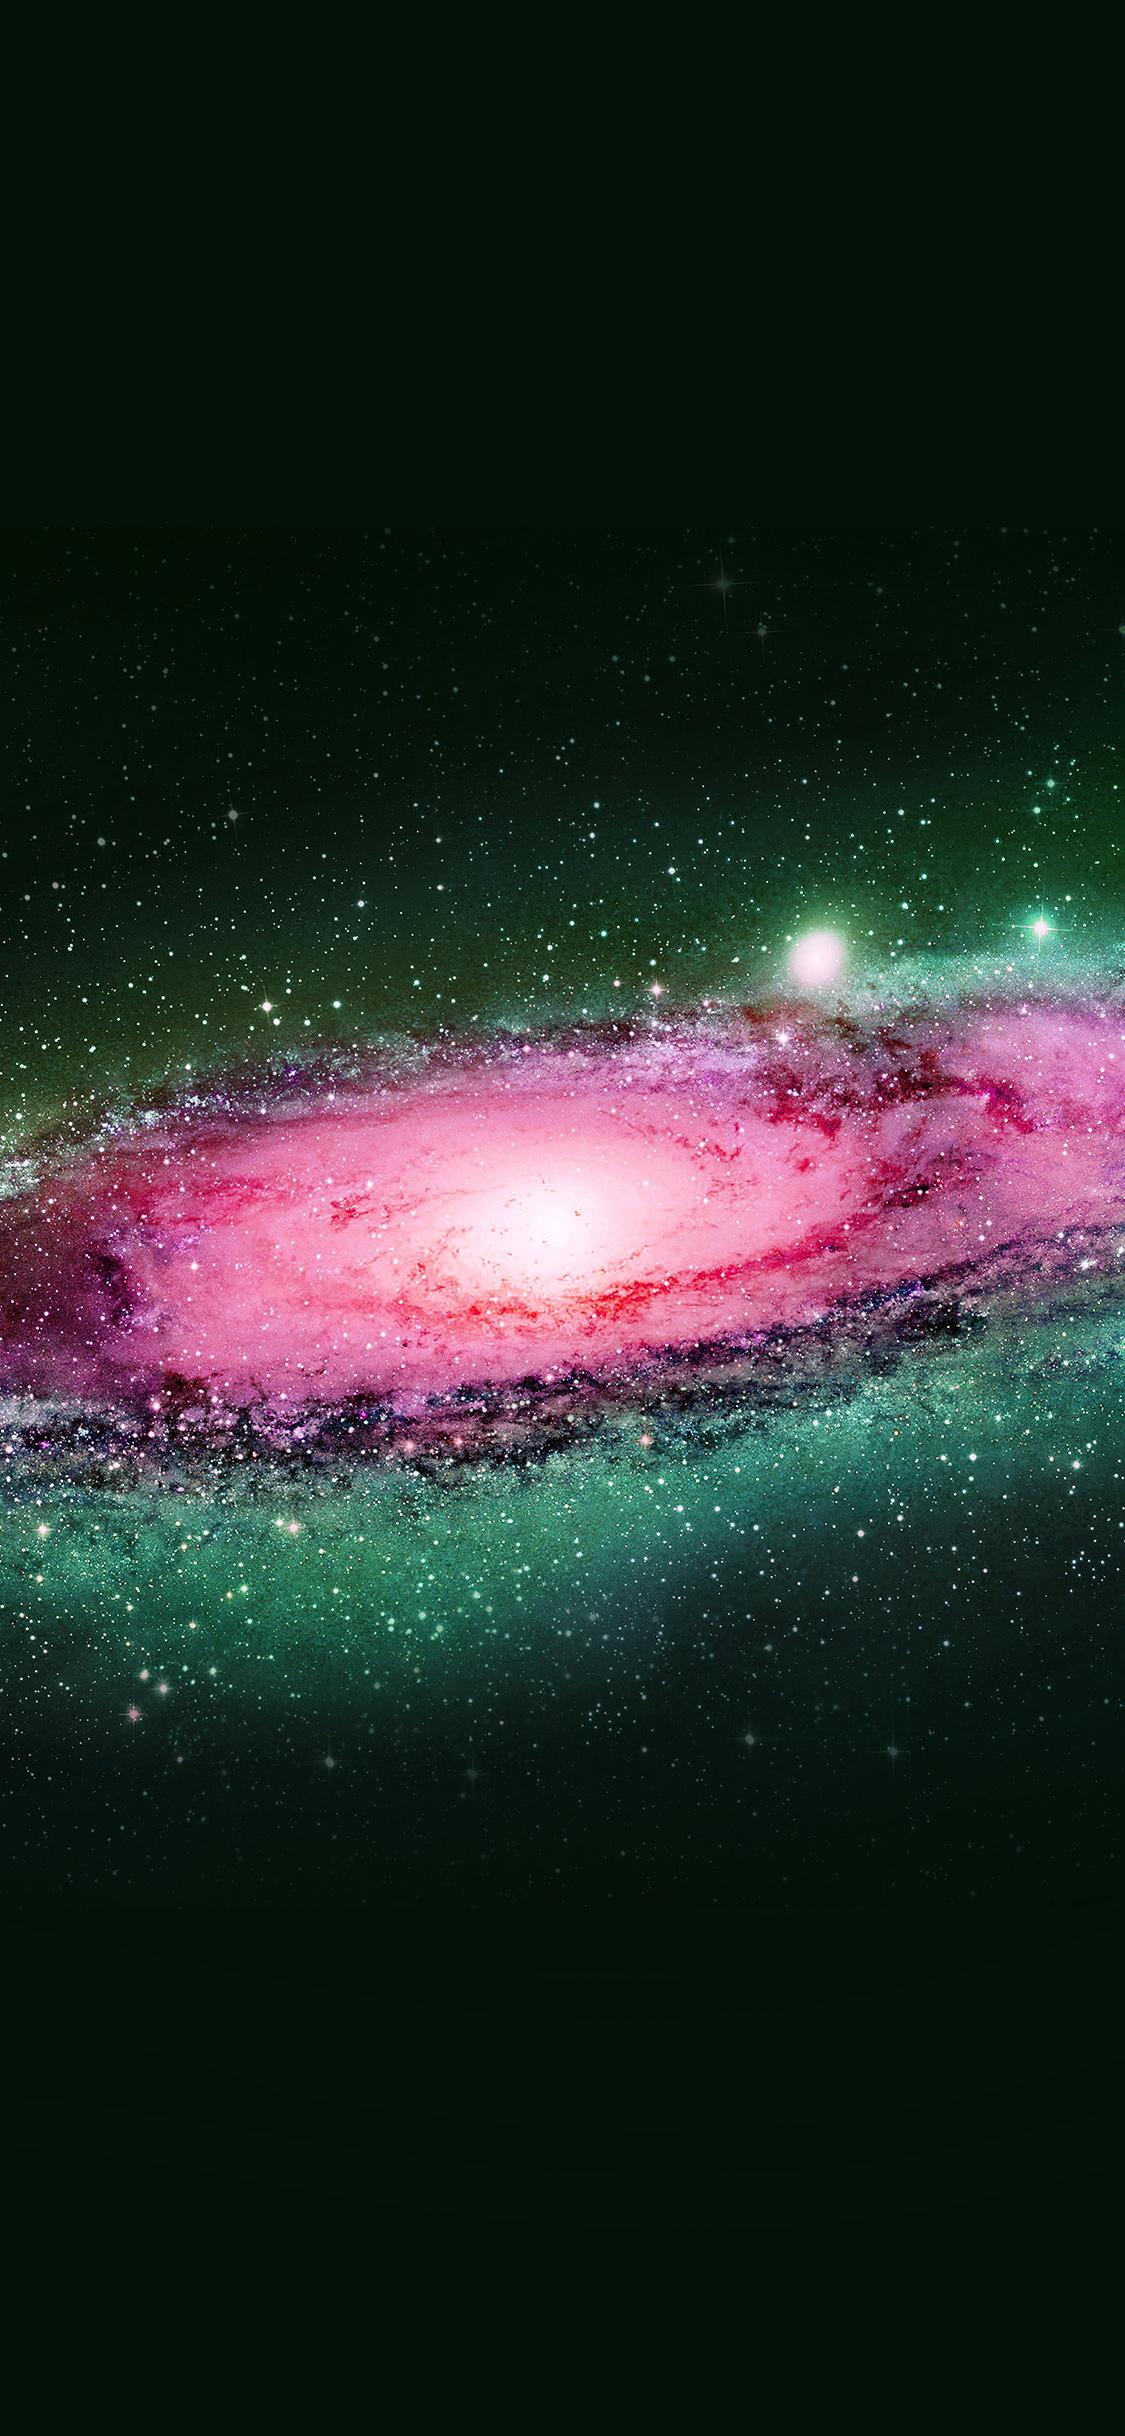 iPhonexpapers.com-Apple-iPhone-wallpaper-al00-galaxy-space-art-illust-planets-dark-green